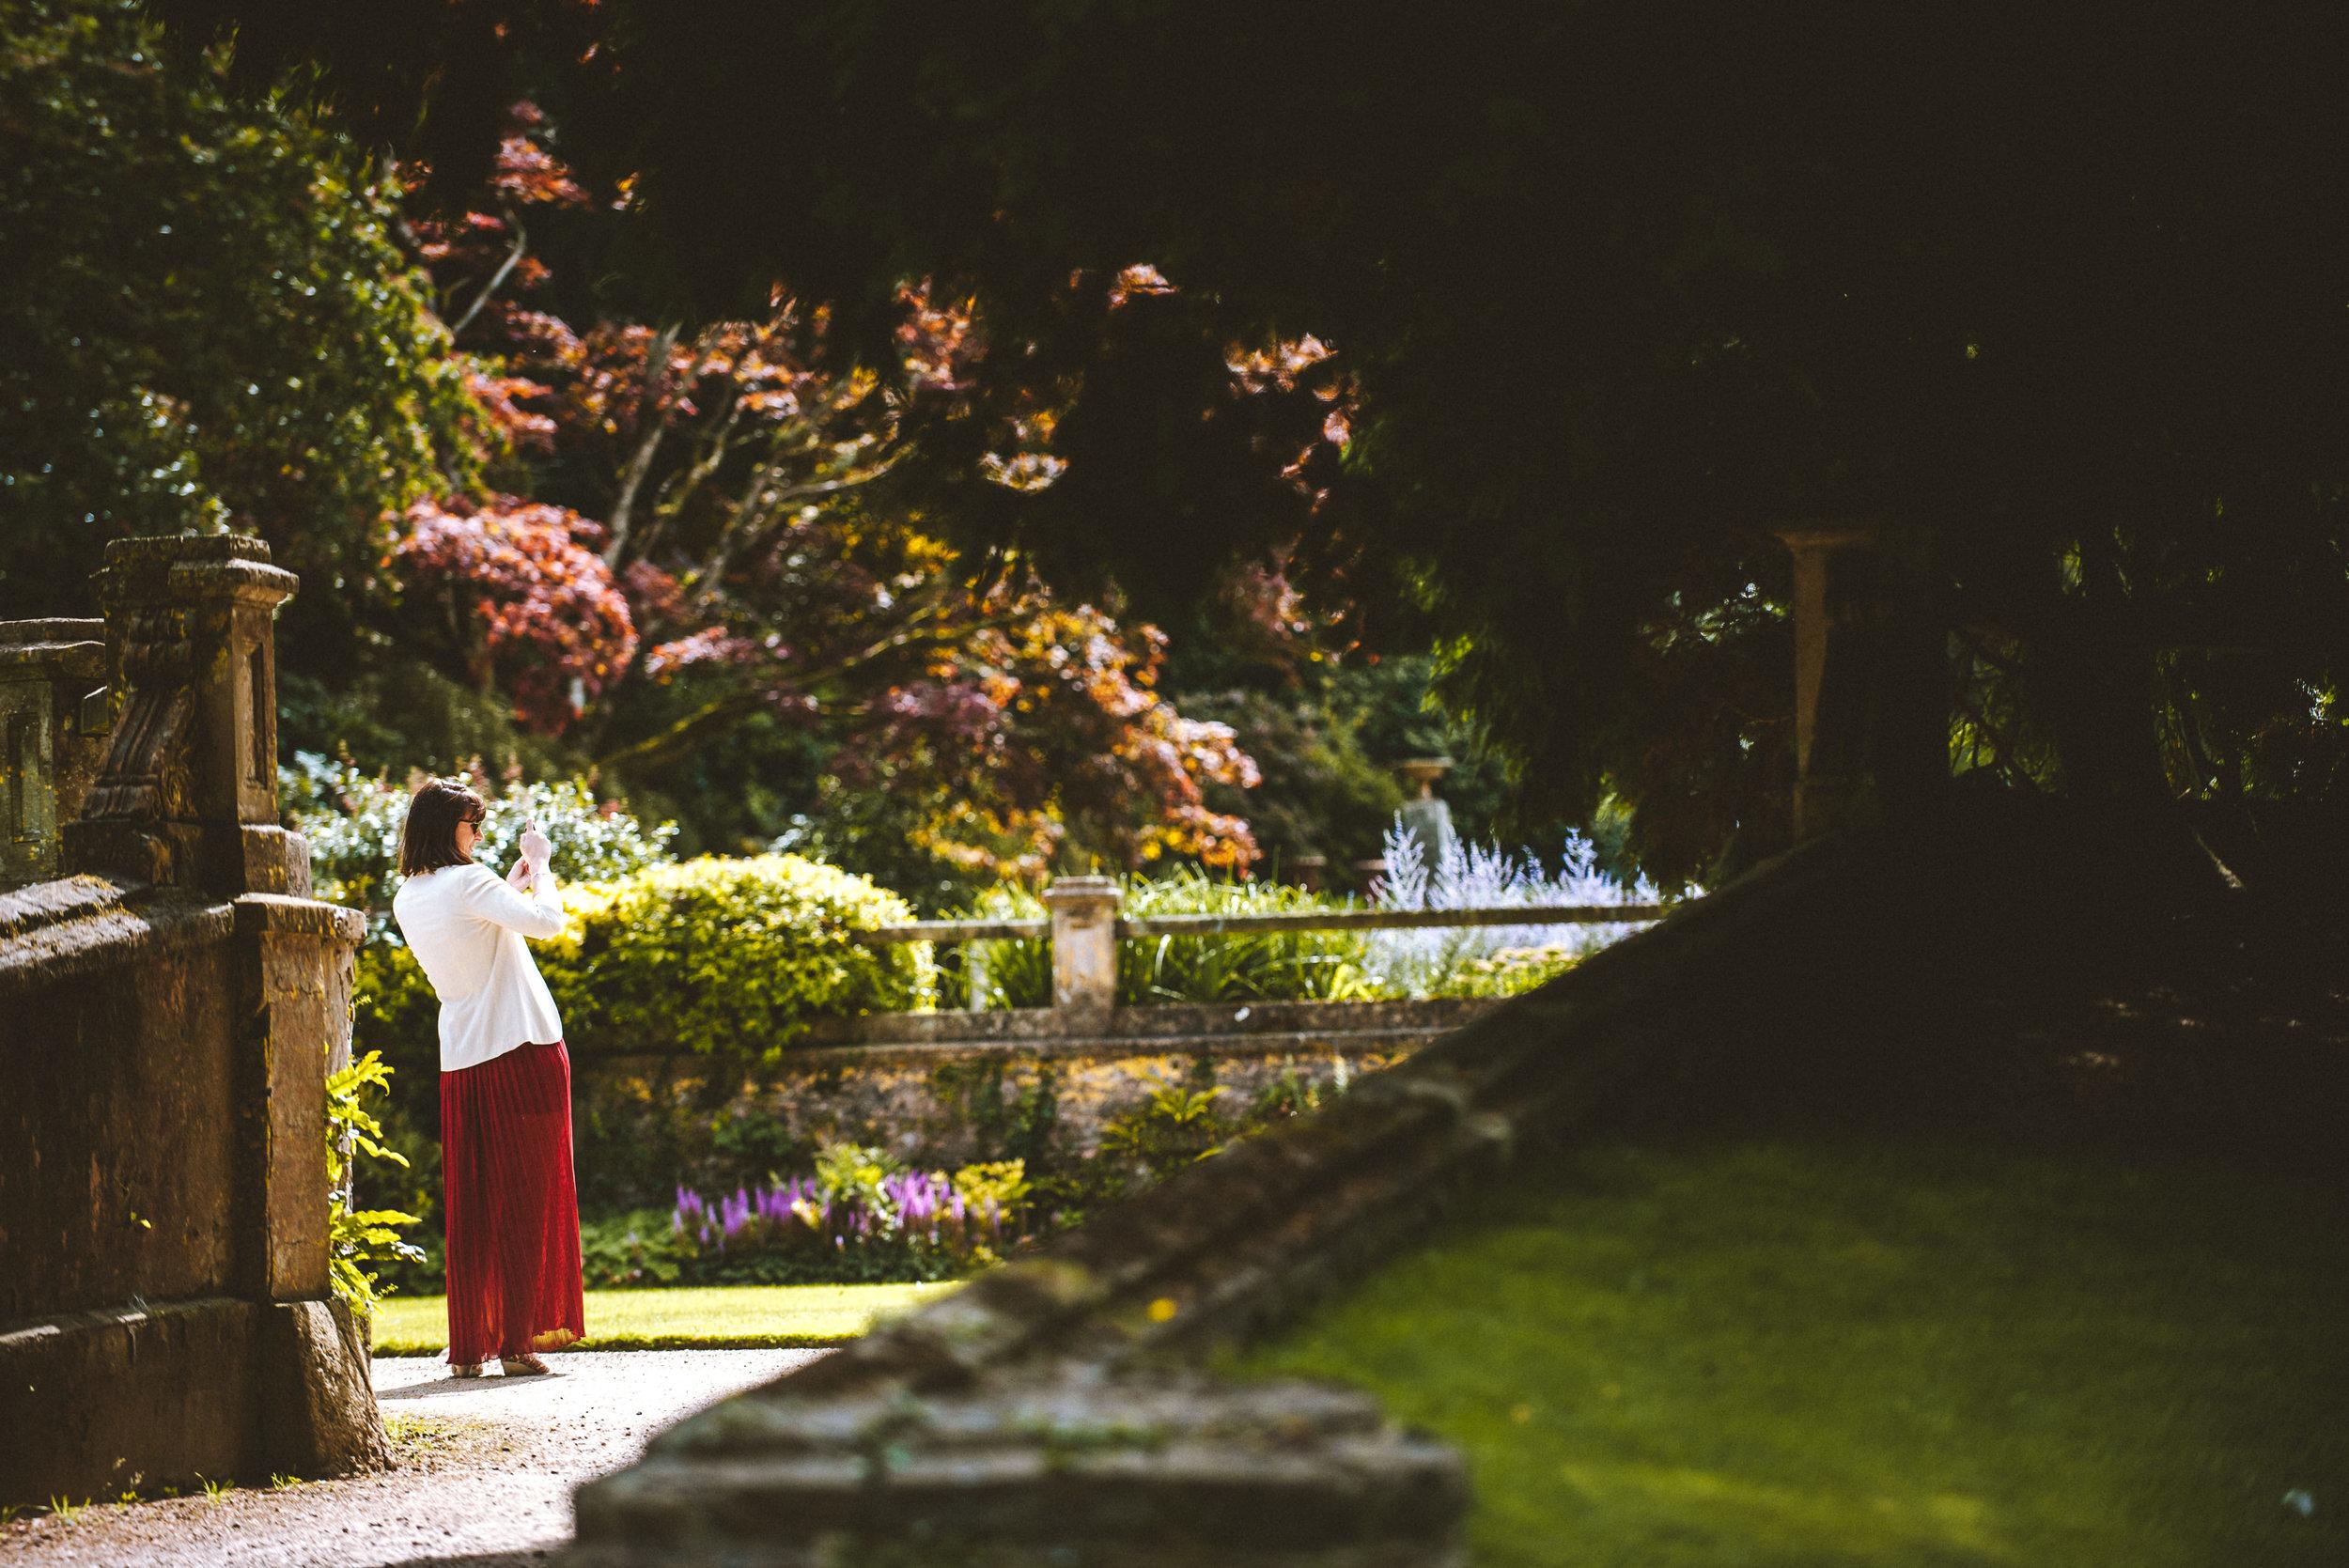 pencarrow-house-wedding-photographer-24.jpg